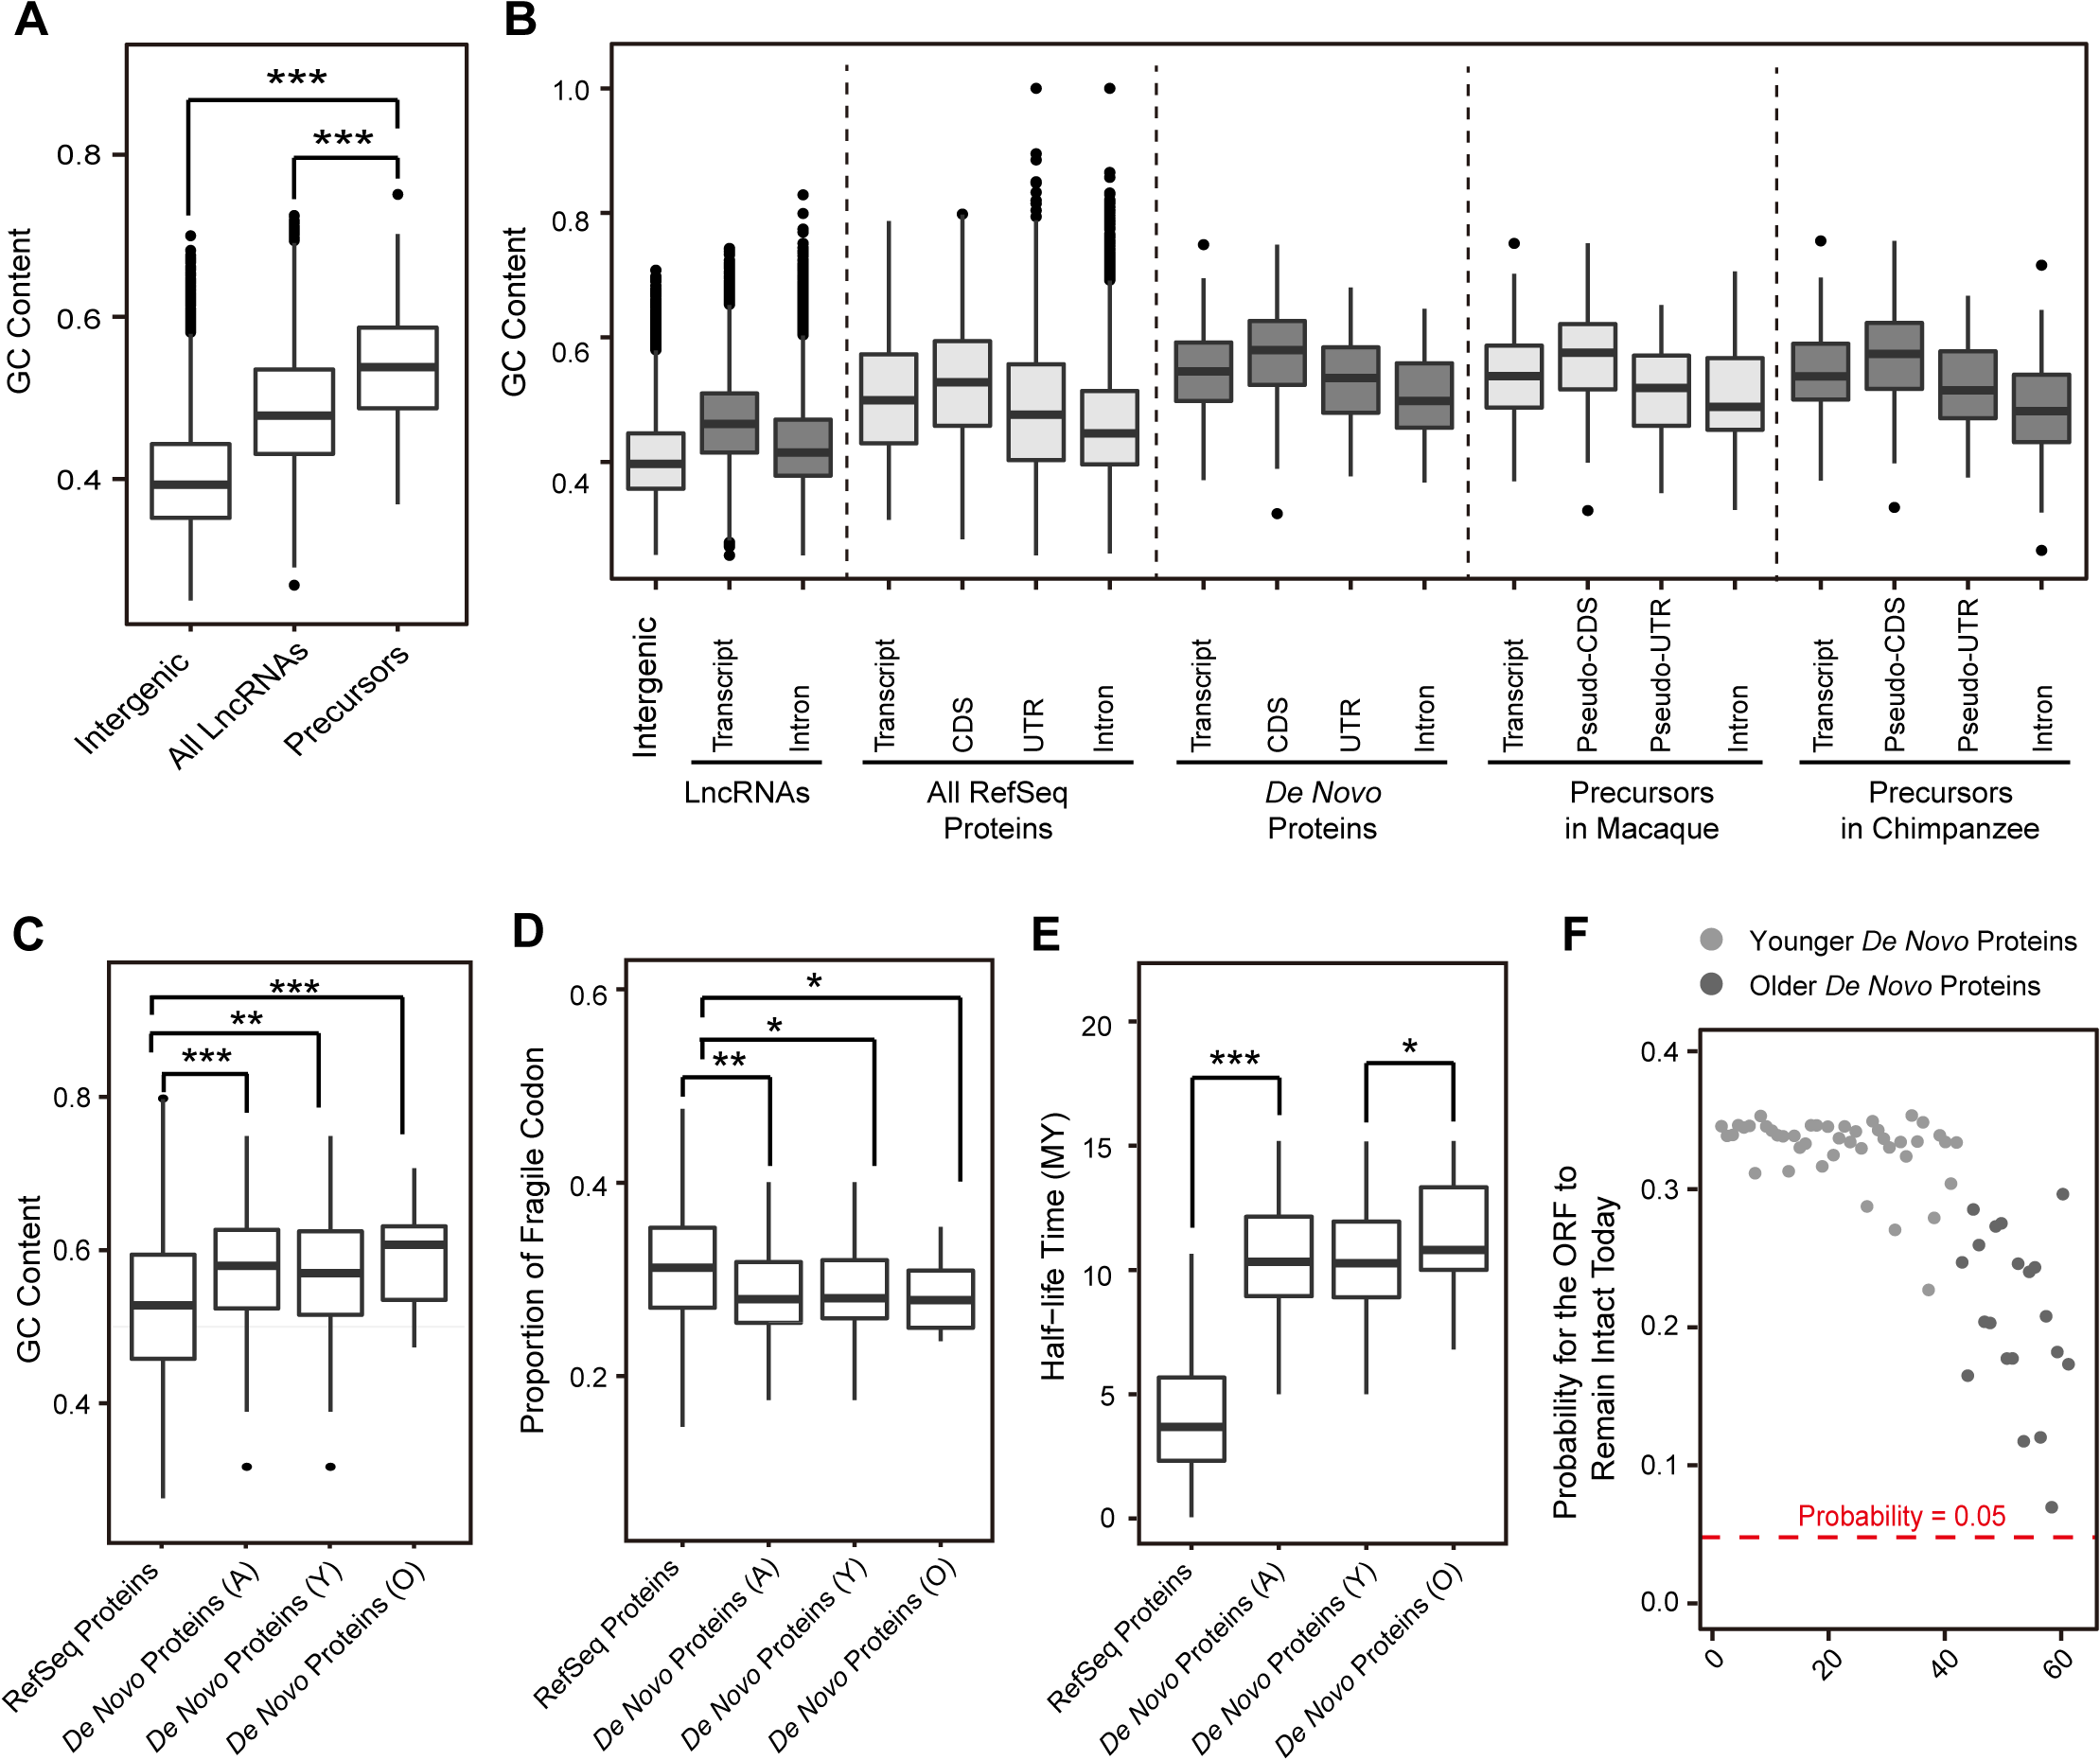 Emergence of human <i>de novo</i> proteins from GC-rich lncRNA precursors.